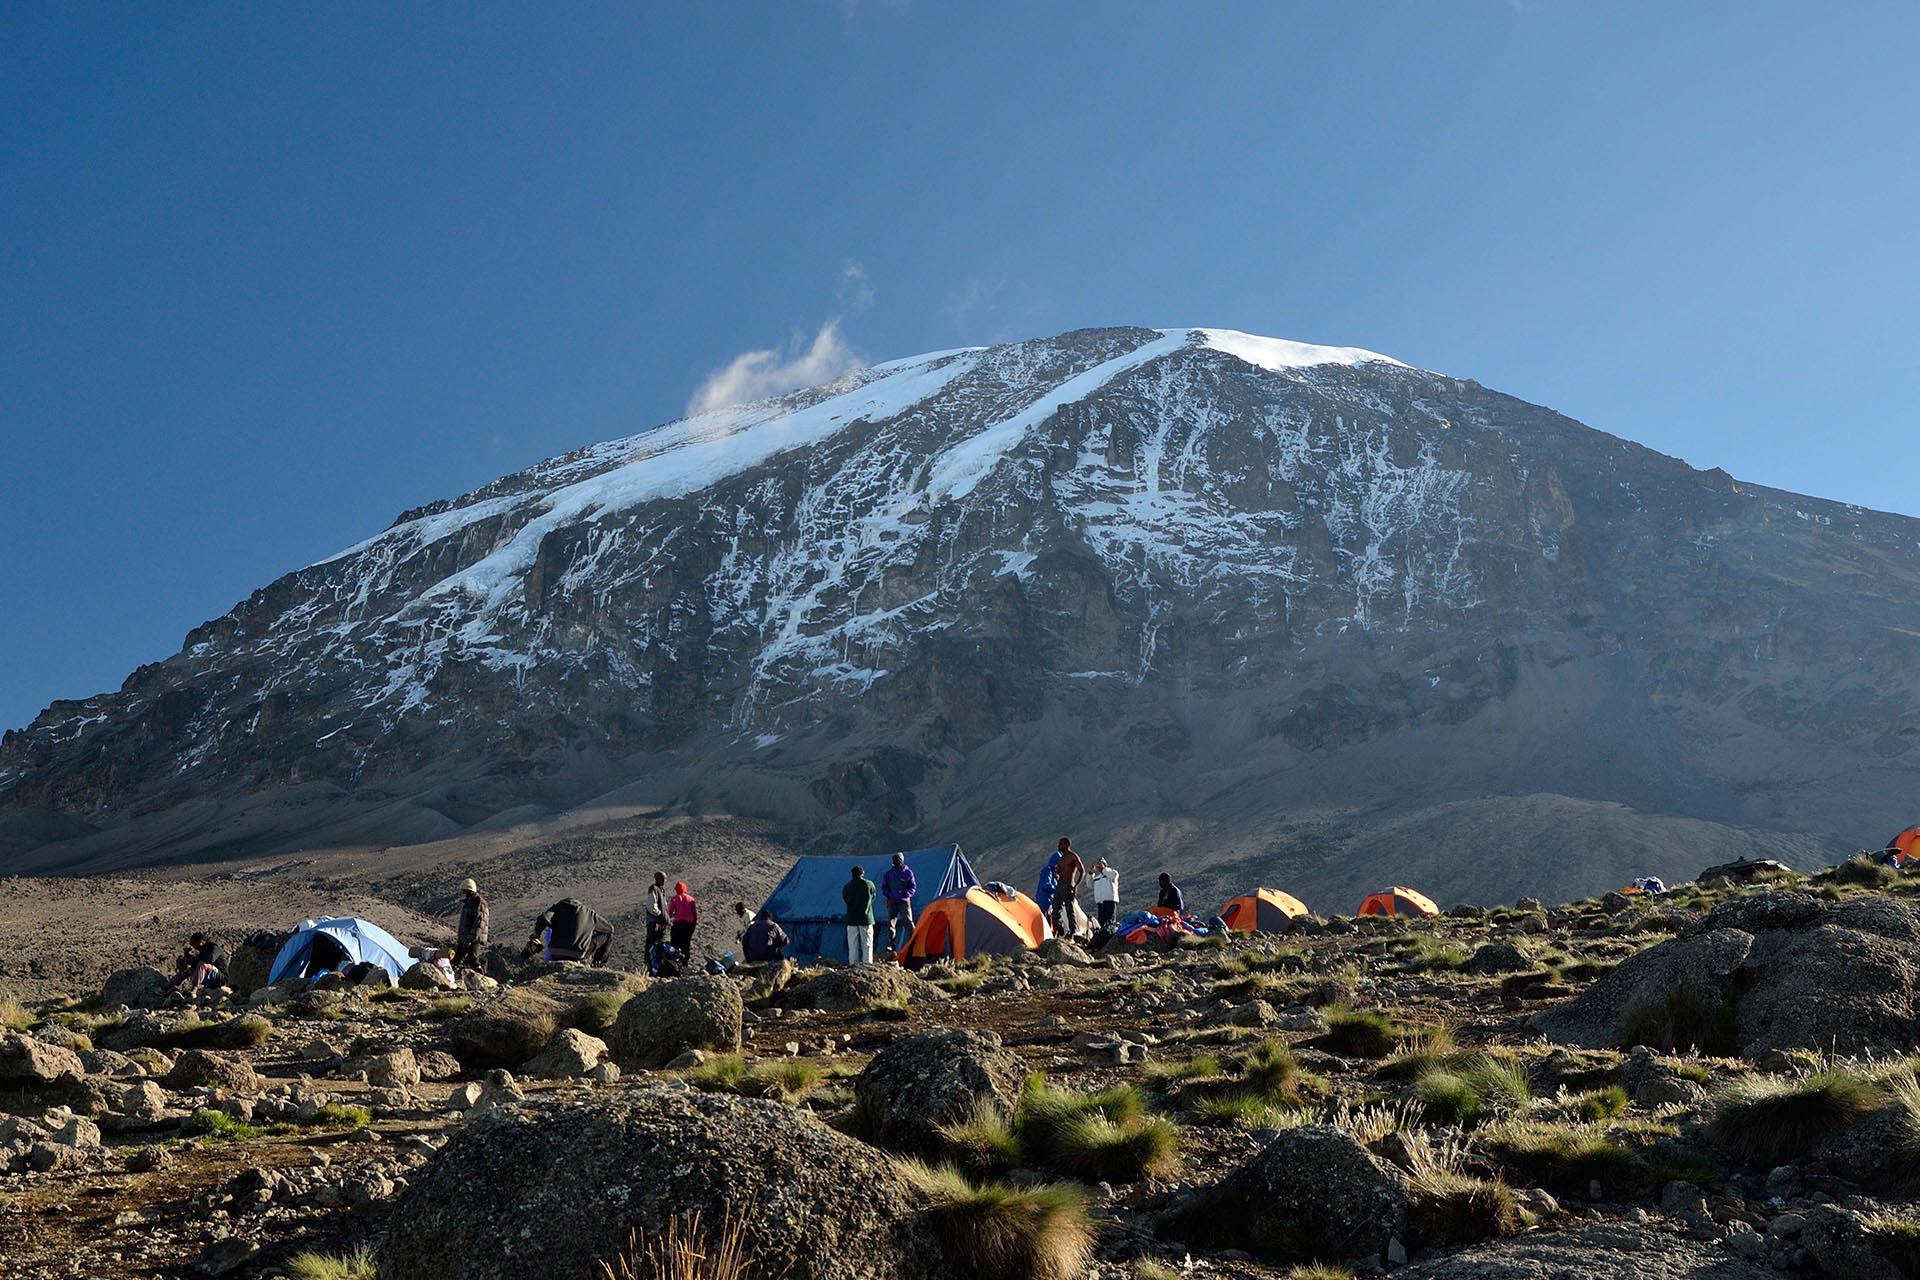 mt-meru-trekking-itineraries-maasai-wanderings-tanzania-africa